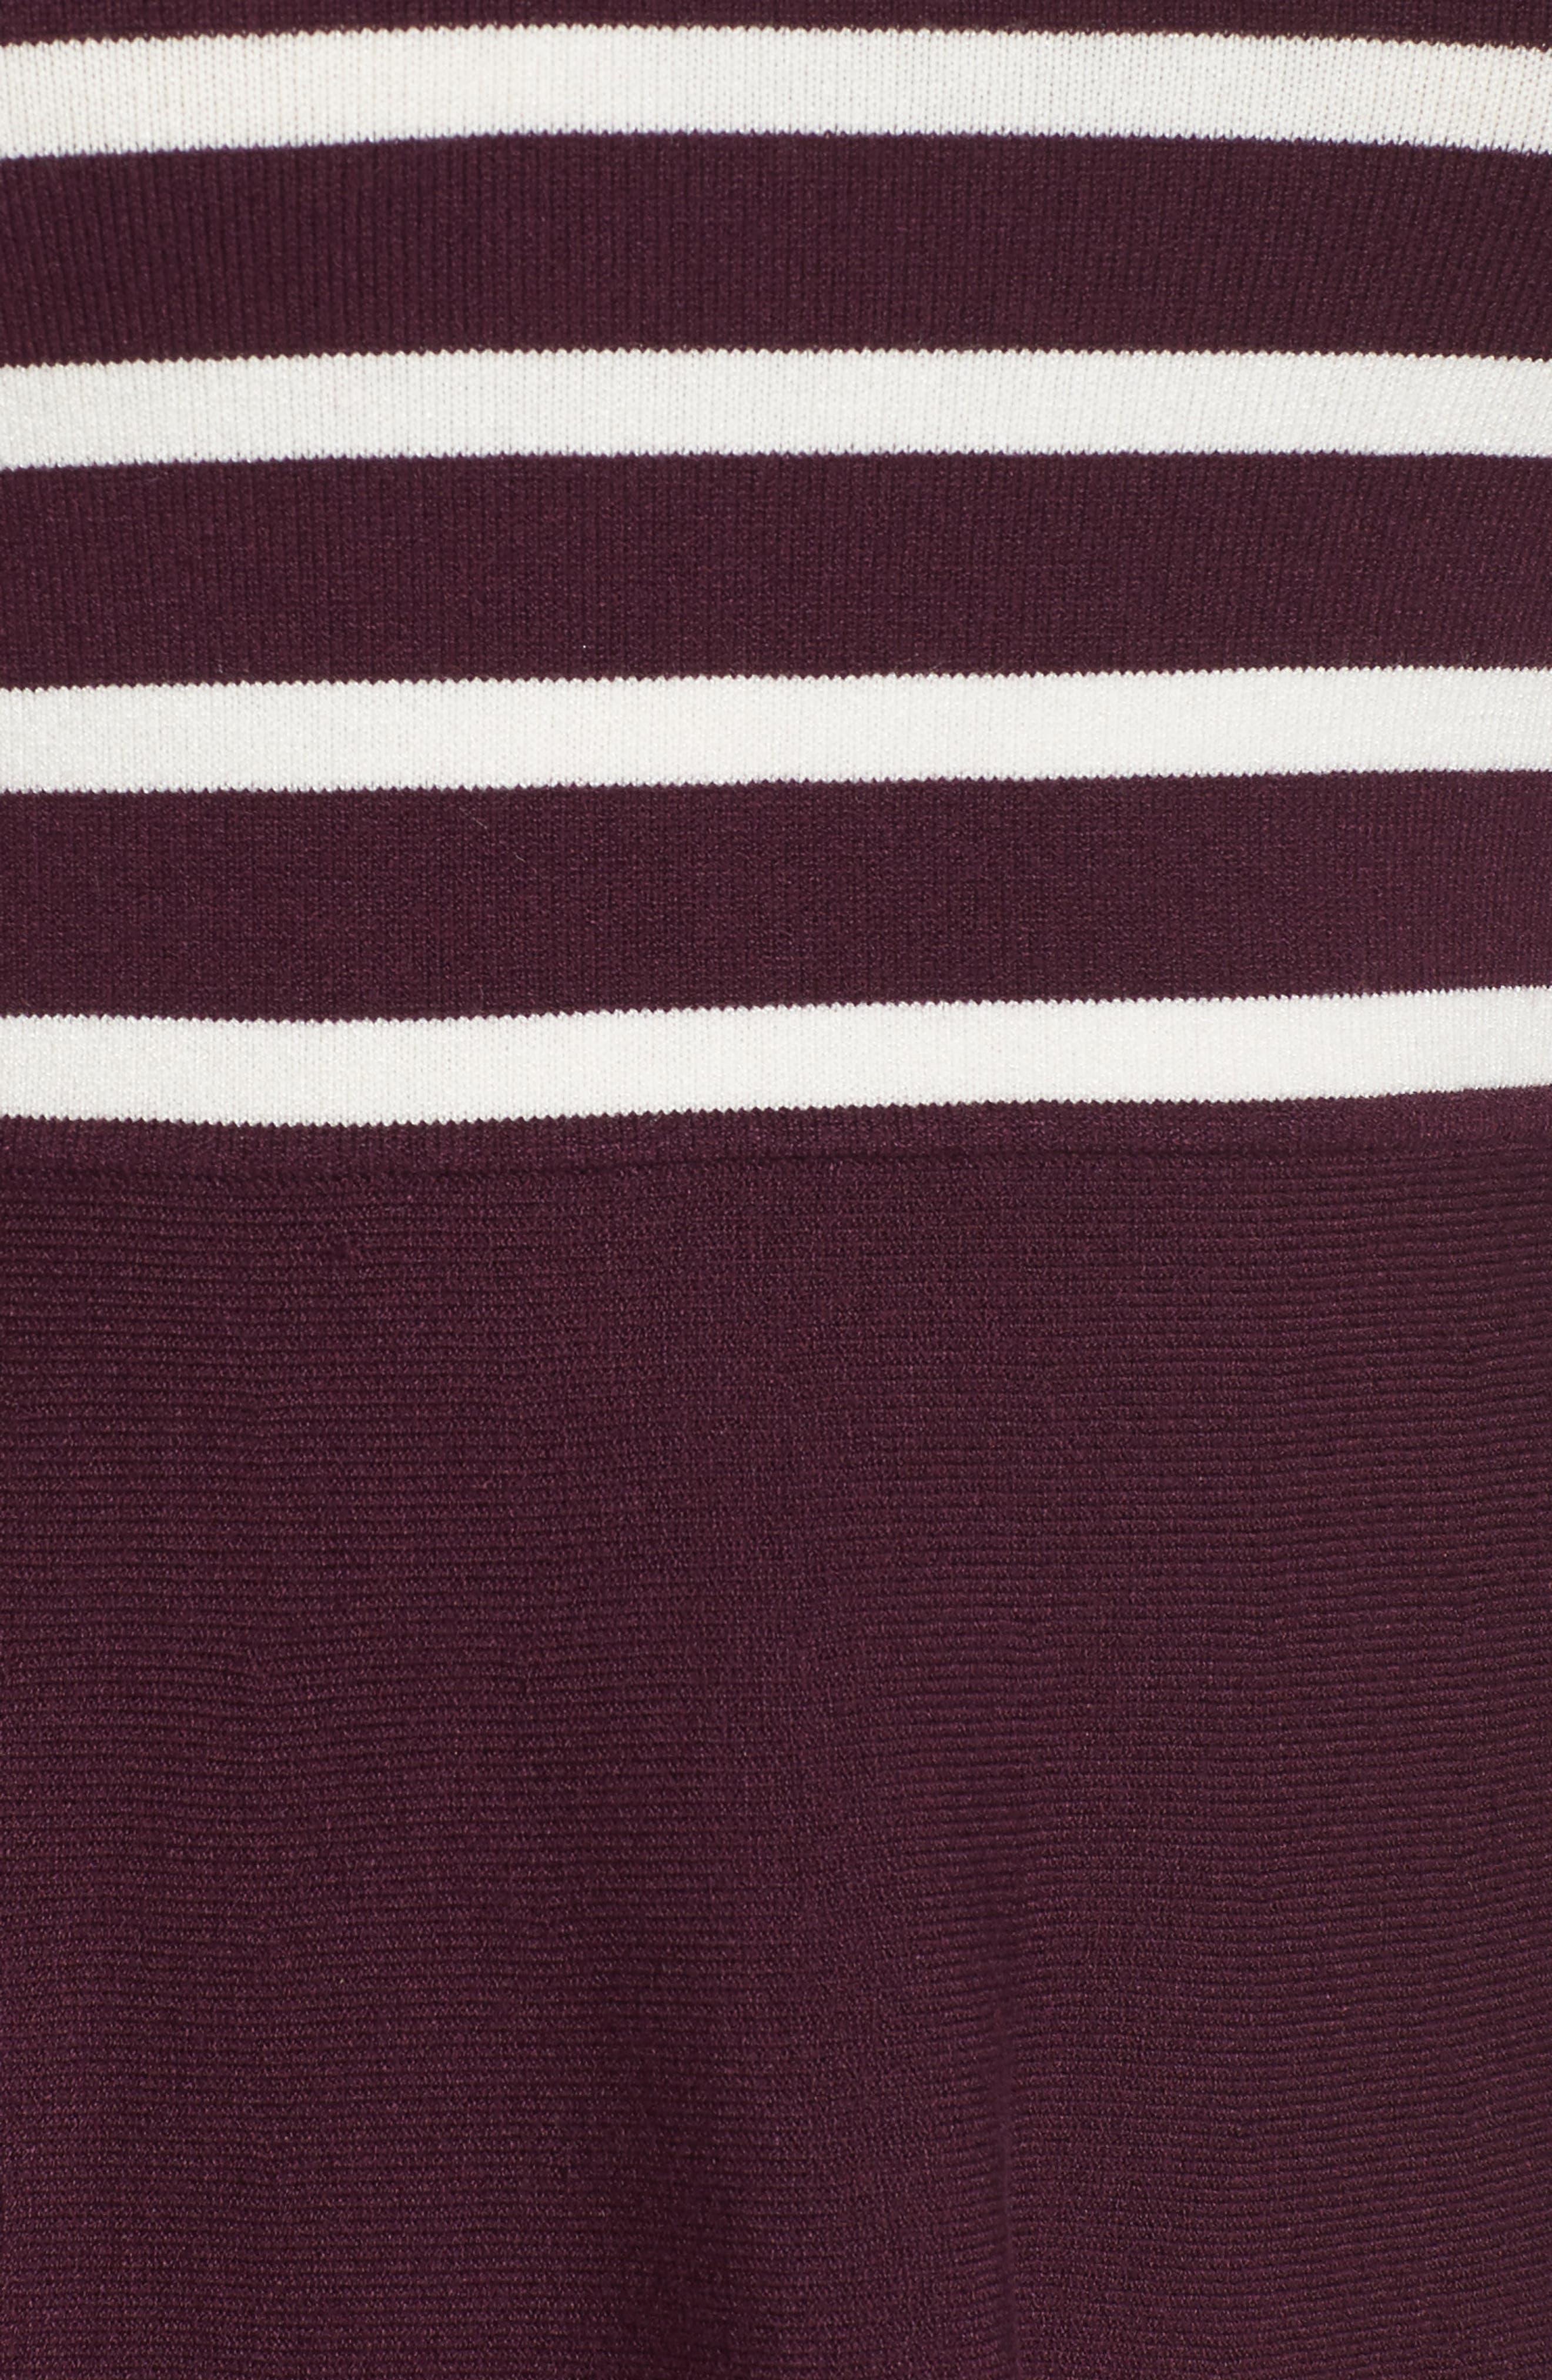 Stripe Mock Neck Fit & Flare Dress,                             Alternate thumbnail 5, color,                             Wine